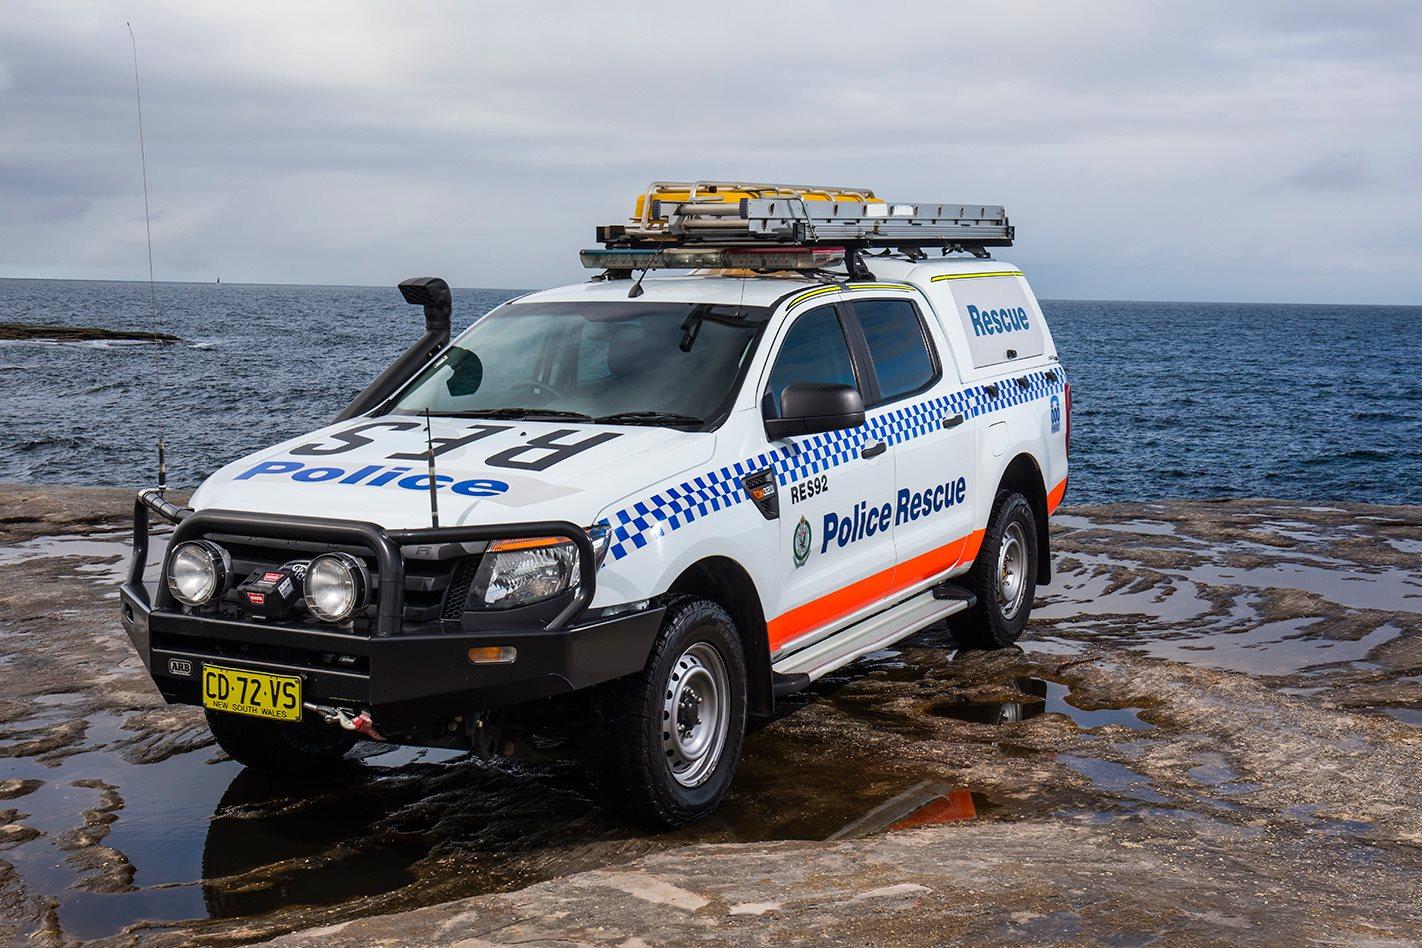 NSW Police Squad HJ47 Cruiser front.jpg